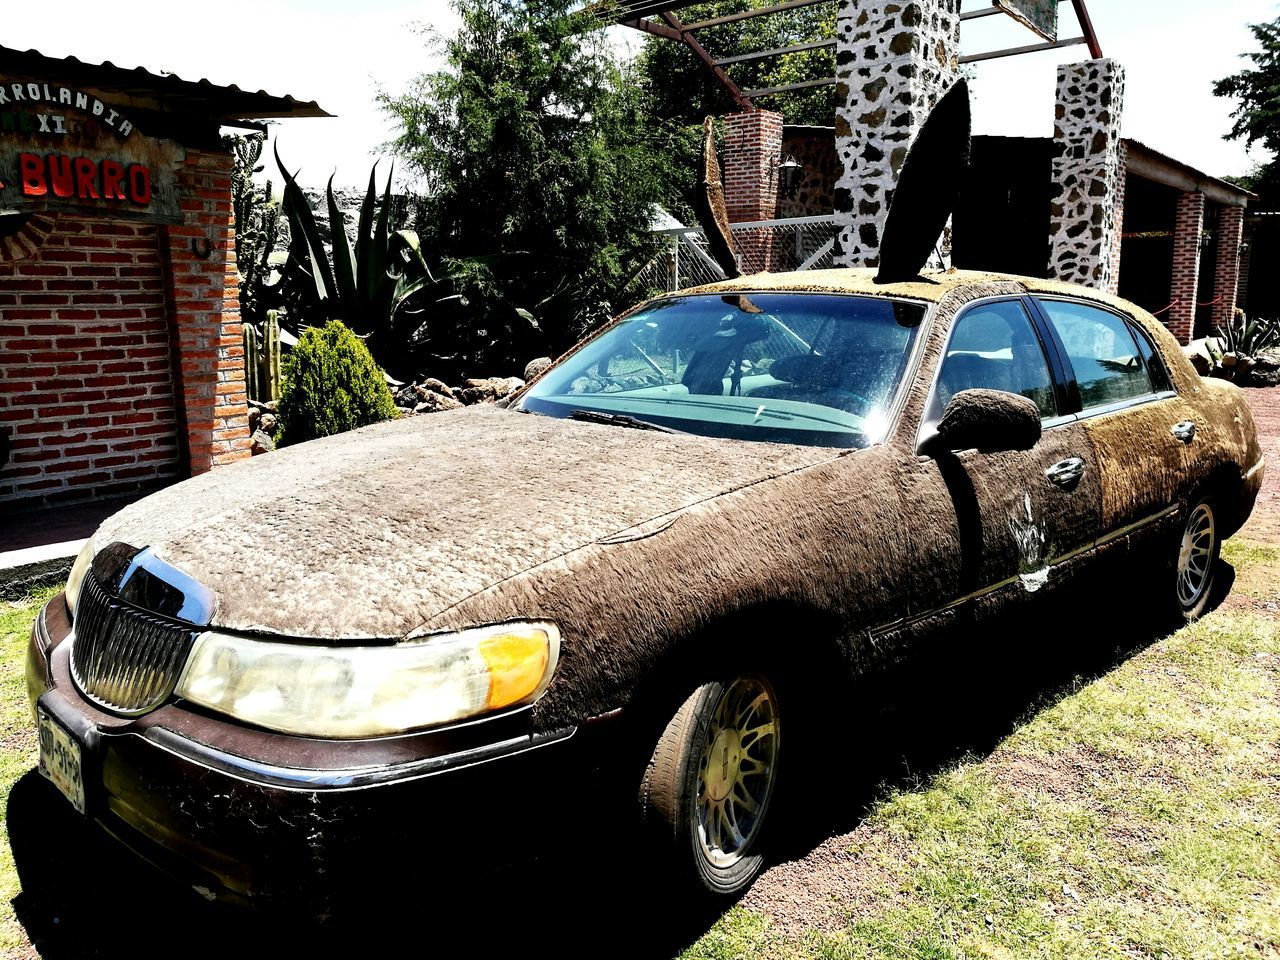 Donkey car, burro auto, otumba, mexico, feria del burro, Donkeyland, Burrolandia